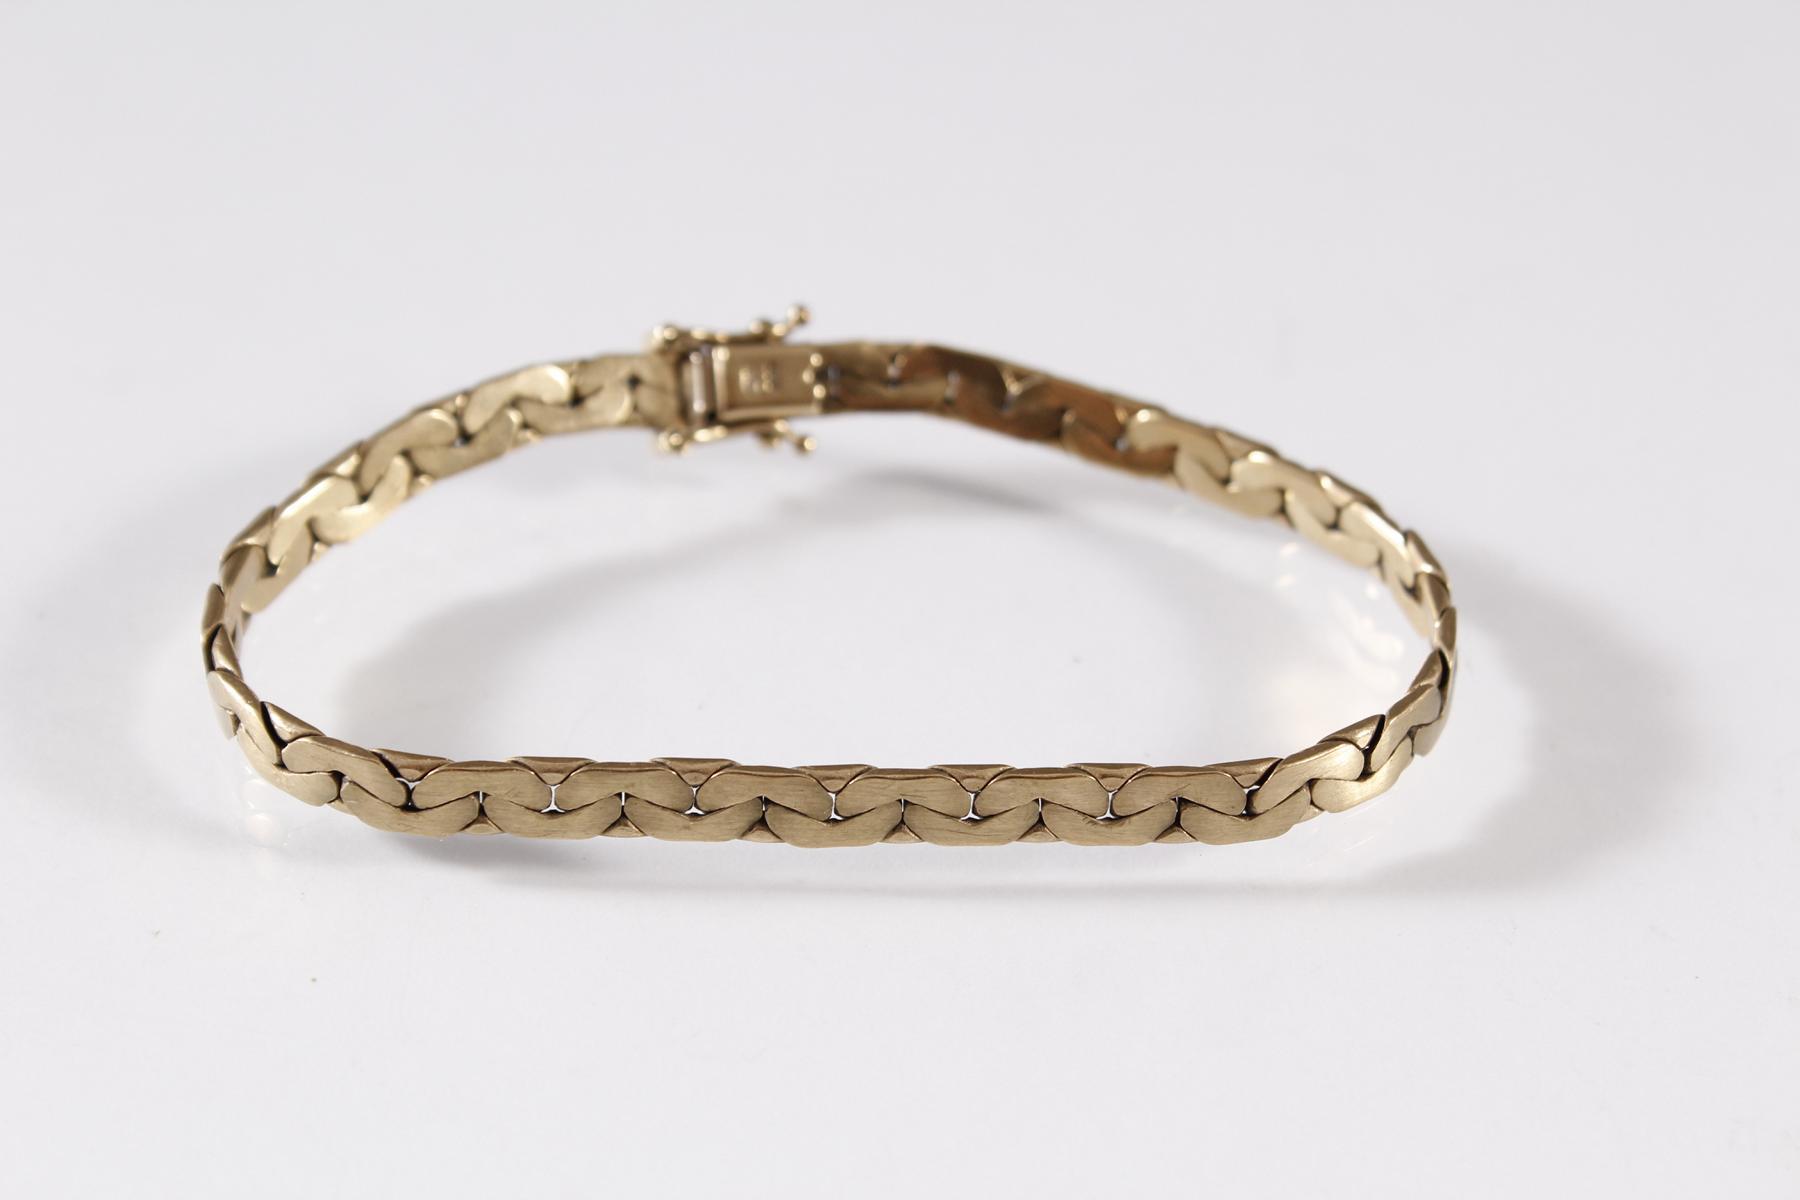 Damen-Armband, 8 Karat Gelbgold